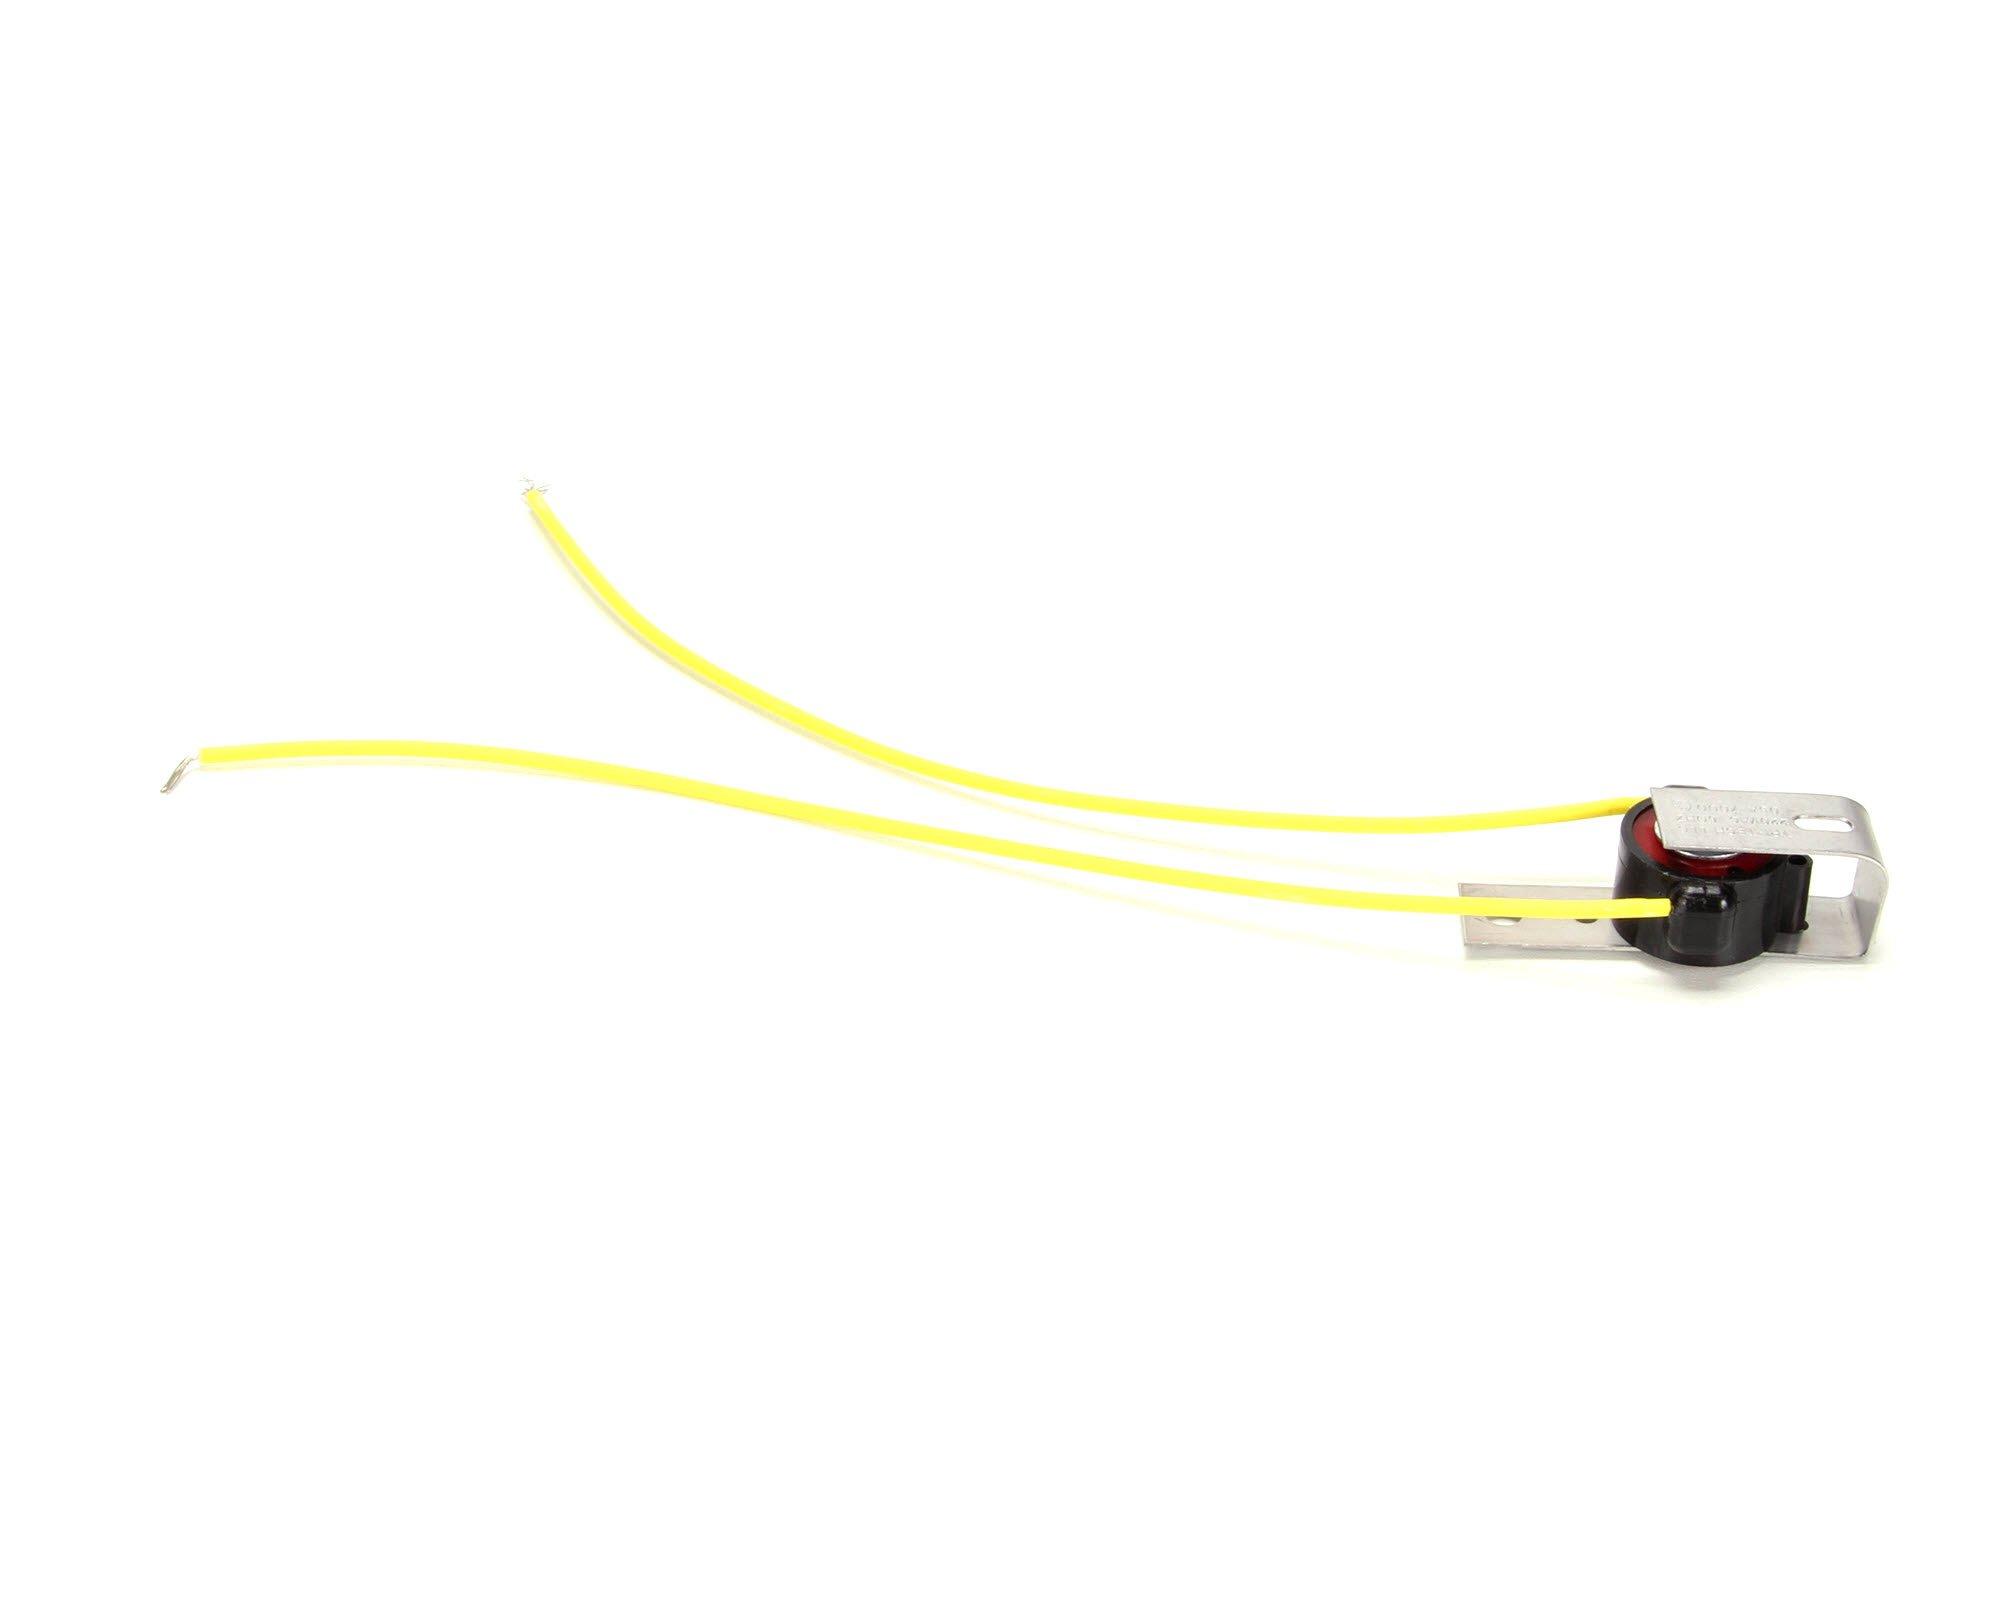 Southbend Range 1175708 220-volt 60Hz Adjustable Buzzer by Southbend Range (Image #1)